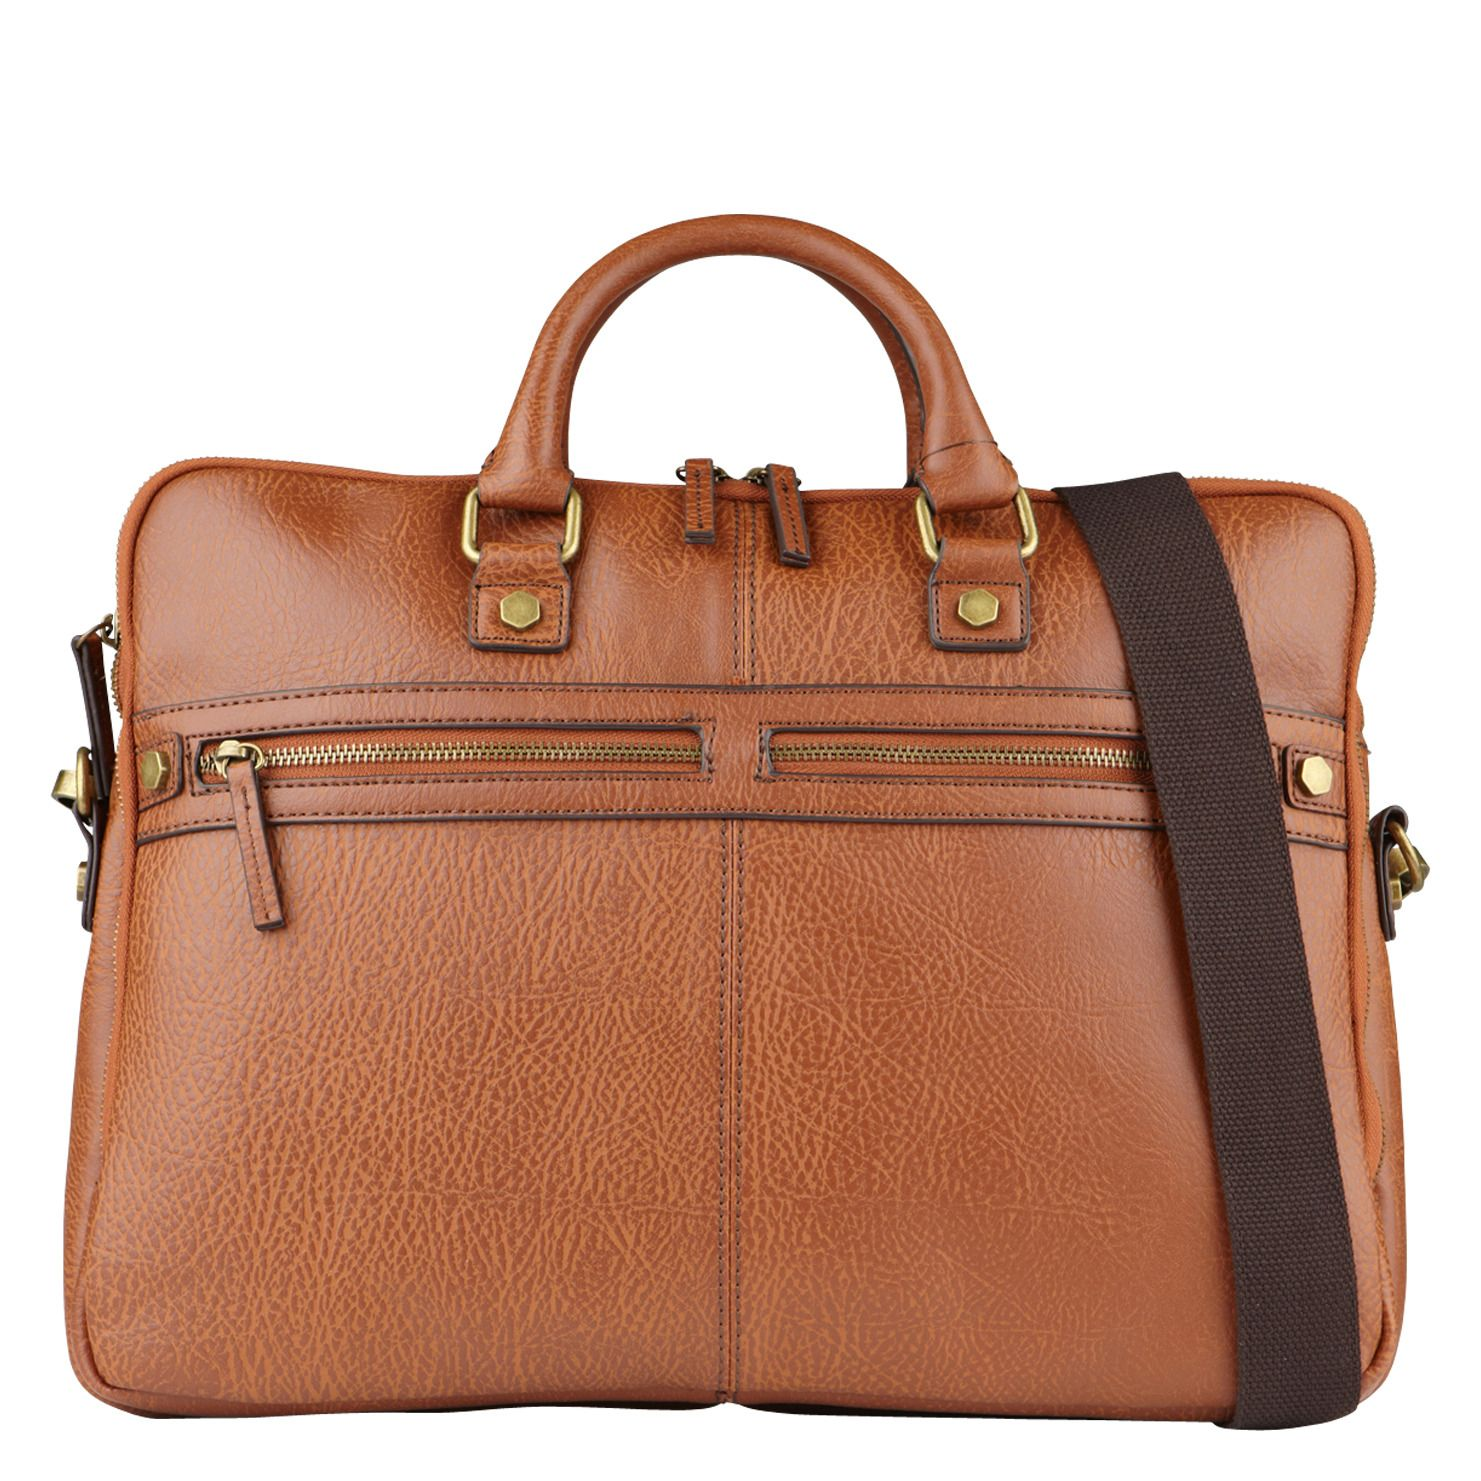 Aldo Shoes Clearance Handbags